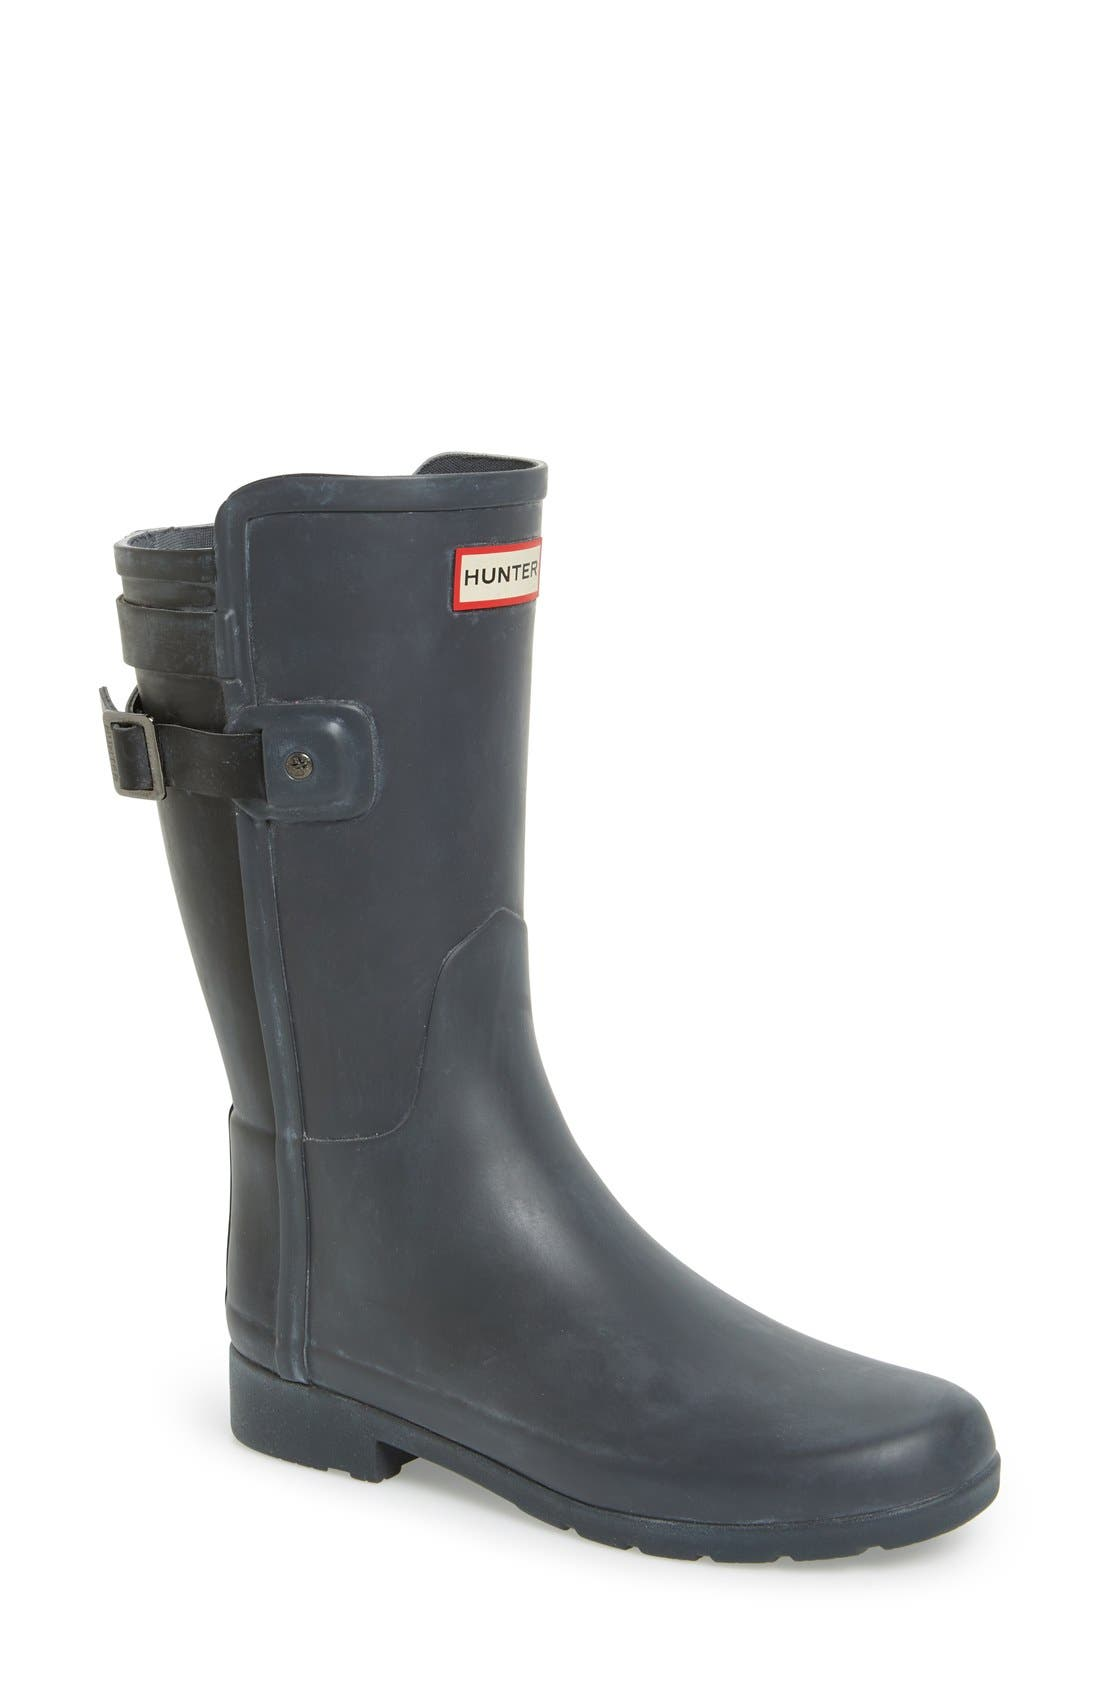 Main Image - Hunter 'Original Refined' Short Rain Boot (Women)